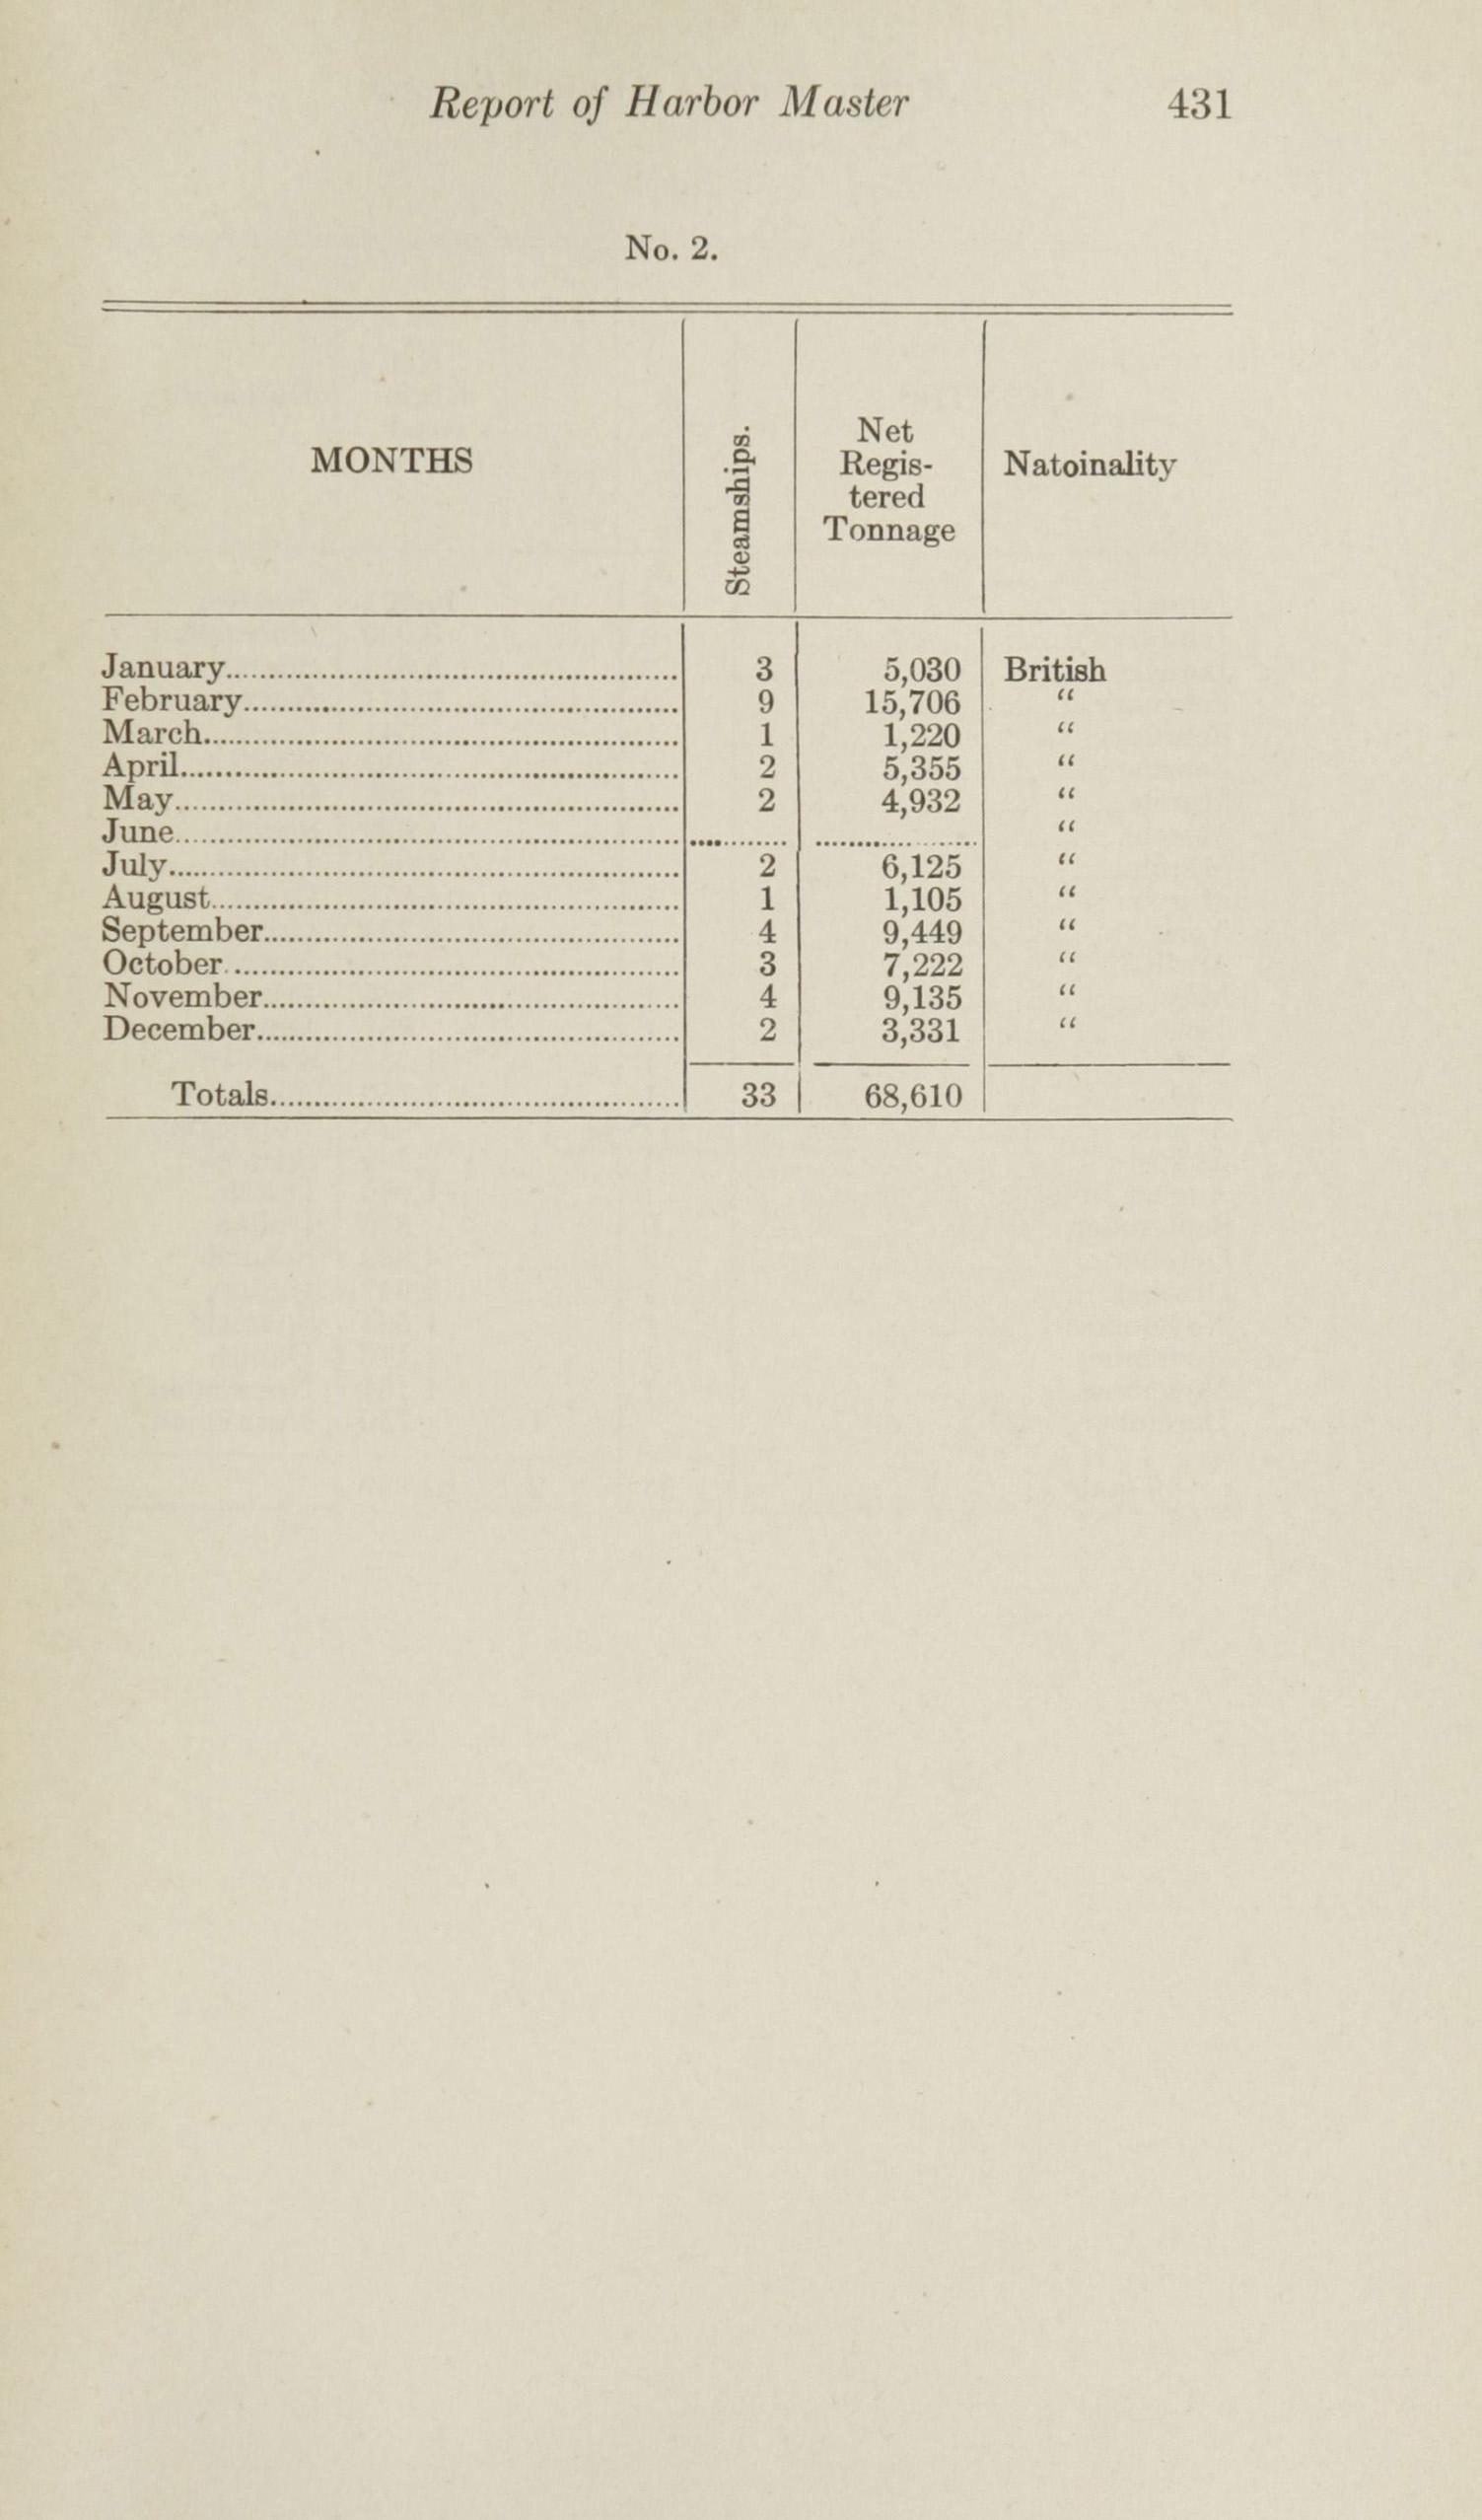 Charleston Yearbook, 1915, page 431